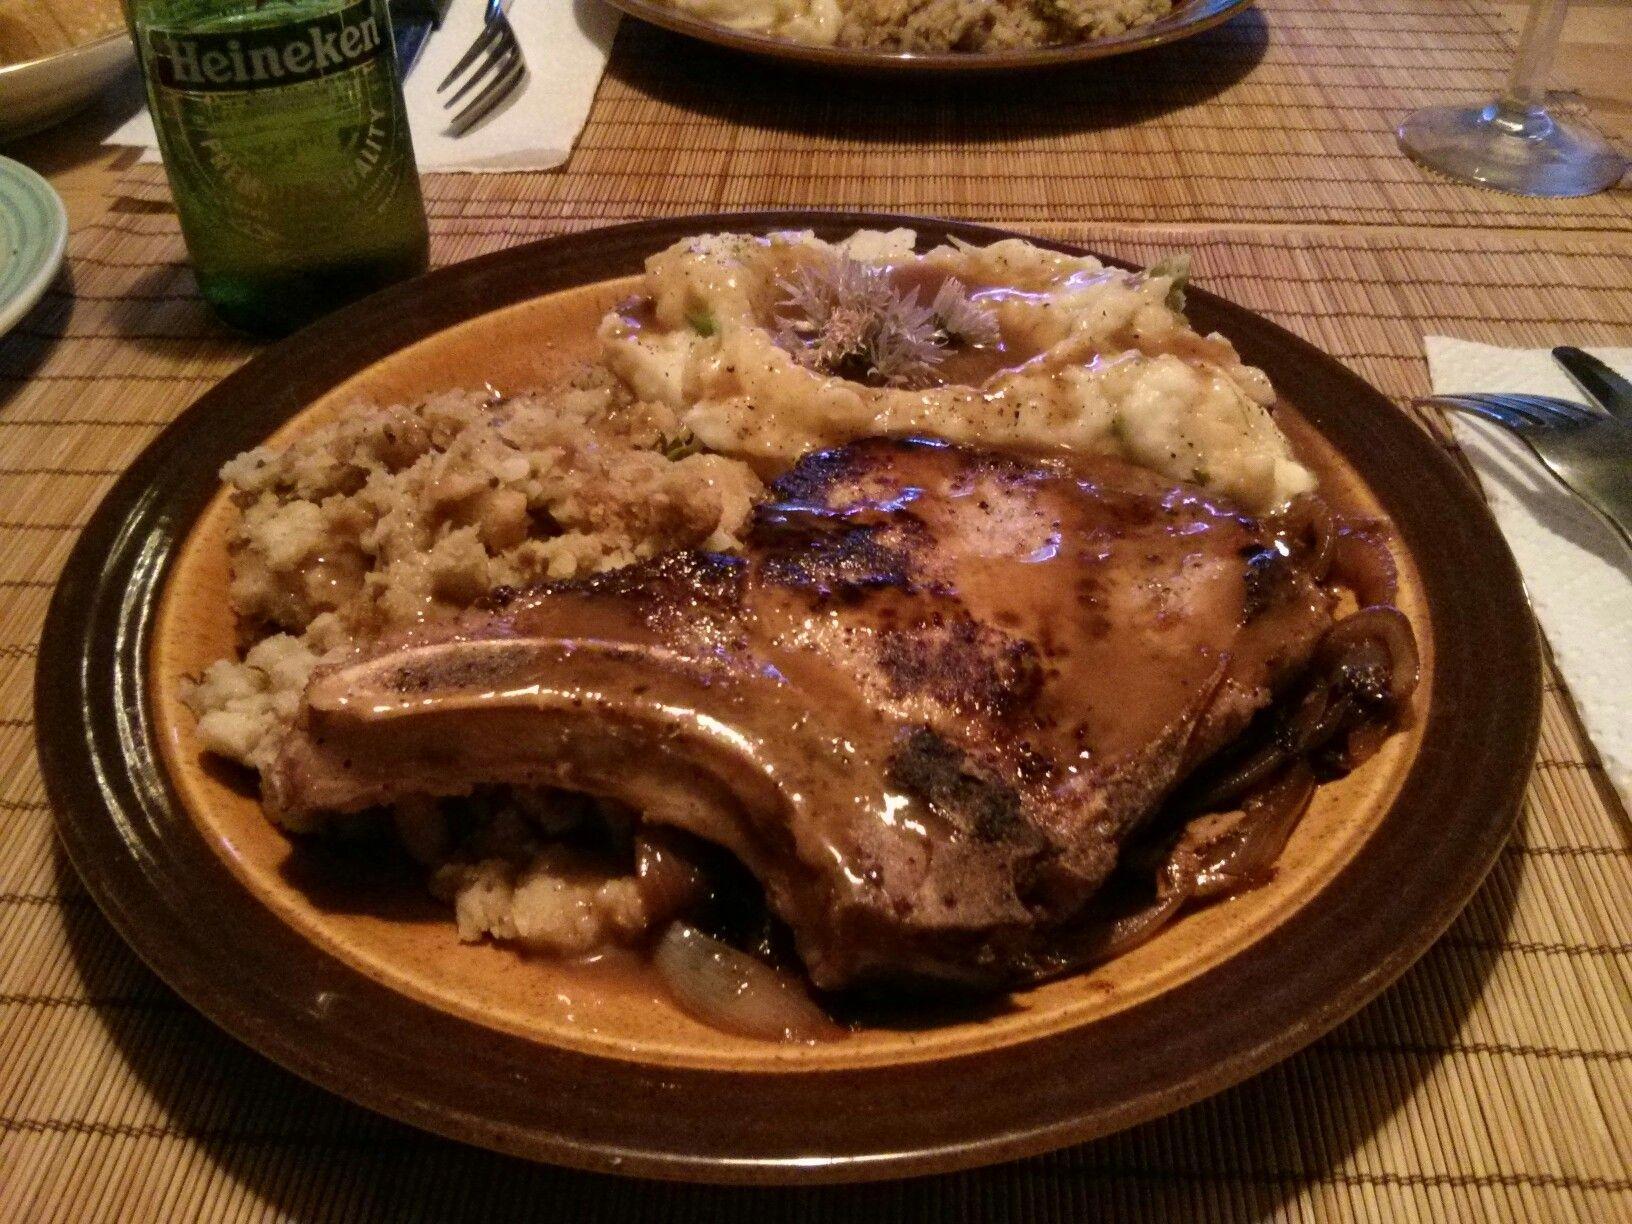 Spanish-style #Fried #Pork Chop, Mashed Potatoes w/ #Gravy & Stuffing #allkindsofrecipes # ...